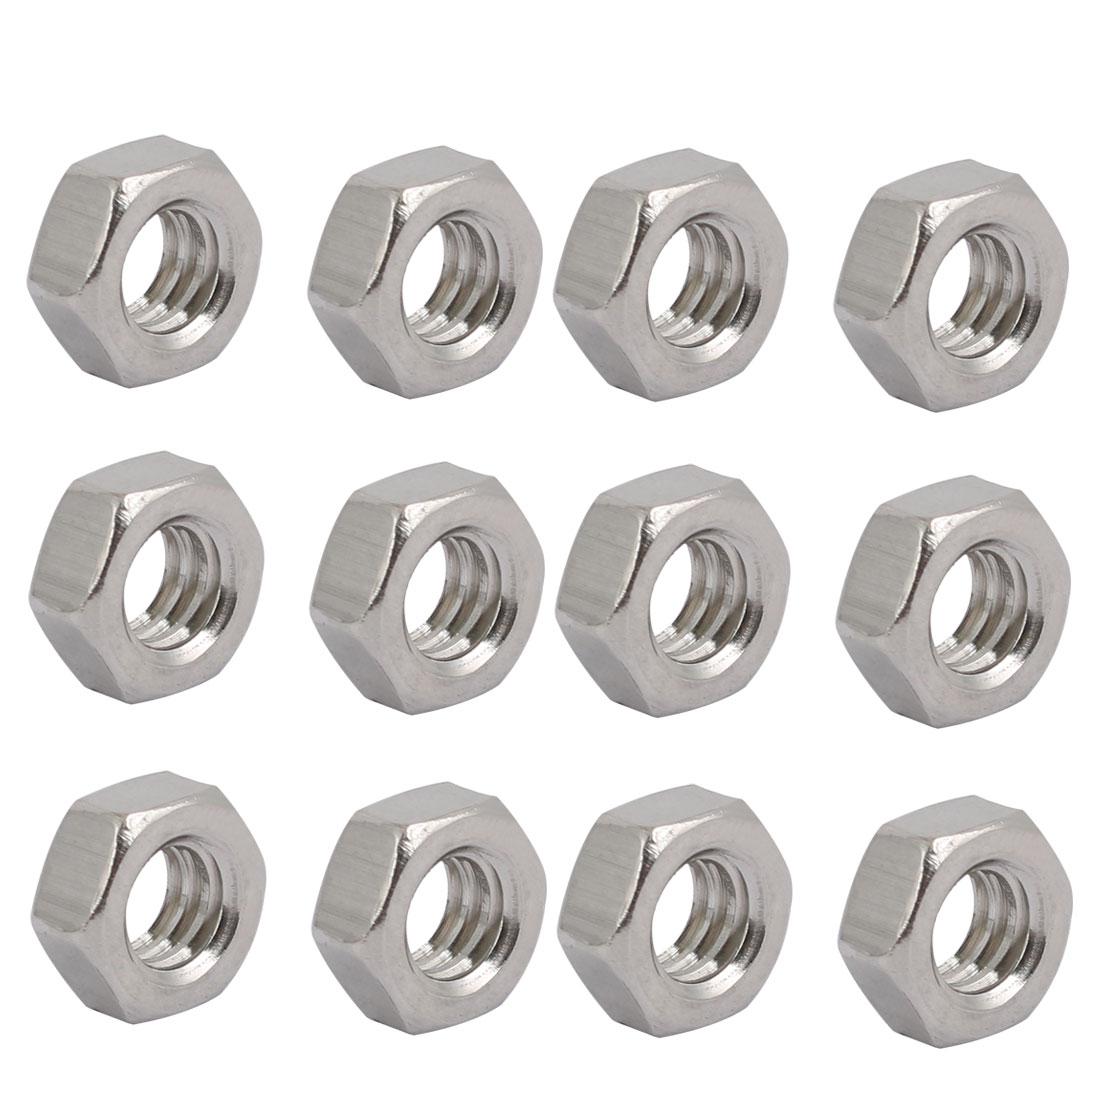 "12pcs 1/4""-20 BSW Thread 304 Stainless Steel Hex Nut Fastener Silver Tone"